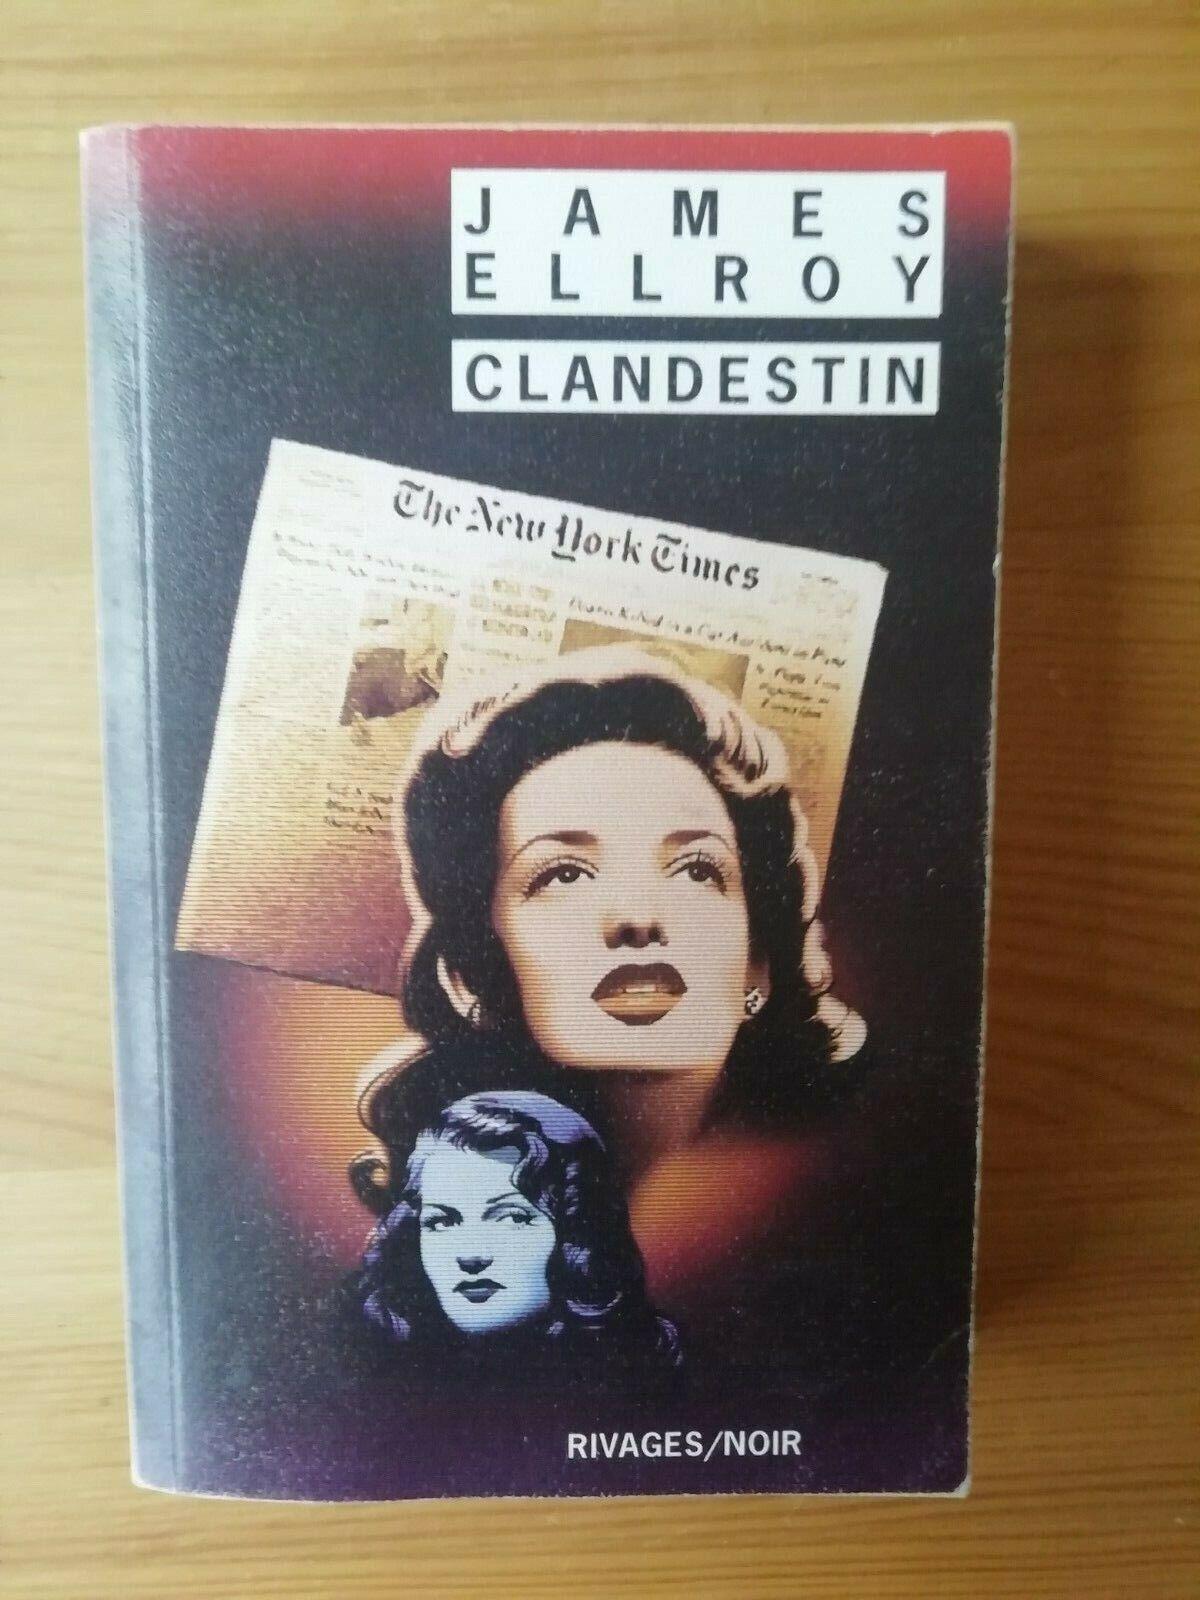 Roman Policier Rivages Noir. James ELLROY. Clandestin